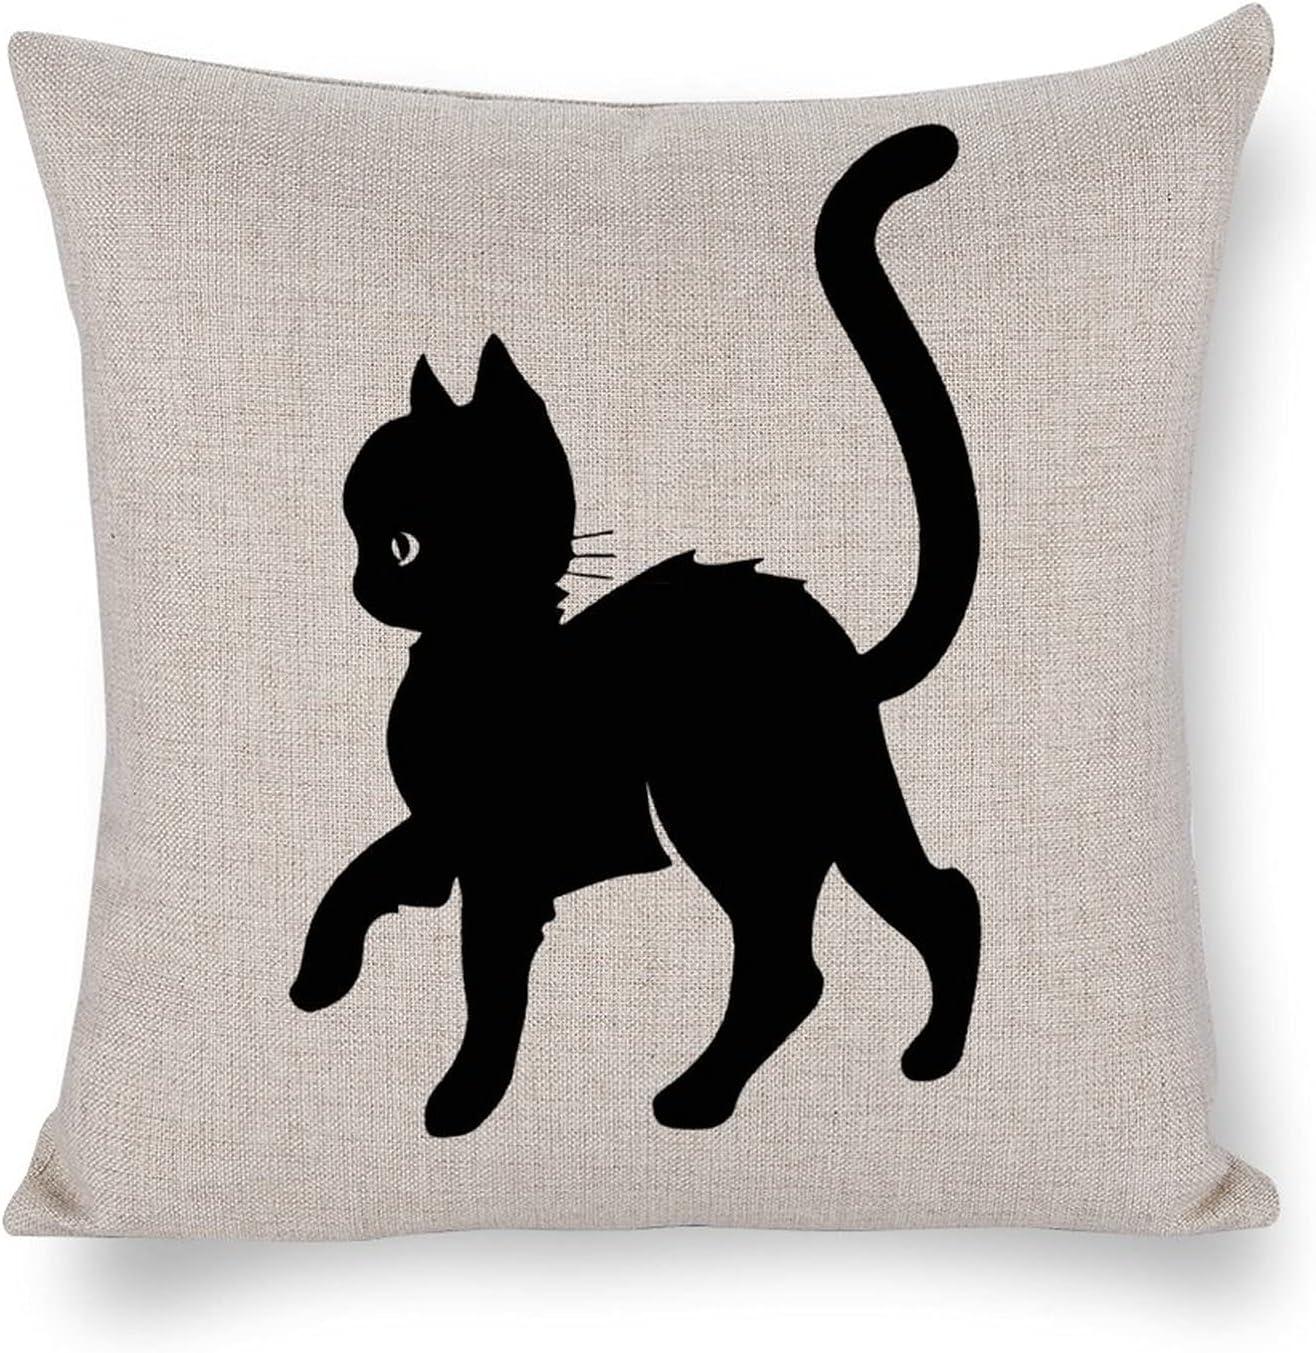 UTF4C Cat Cotton Linen 25% OFF Sofa Sale SALE% OFF Cushion Home Decorati Art Design Bed